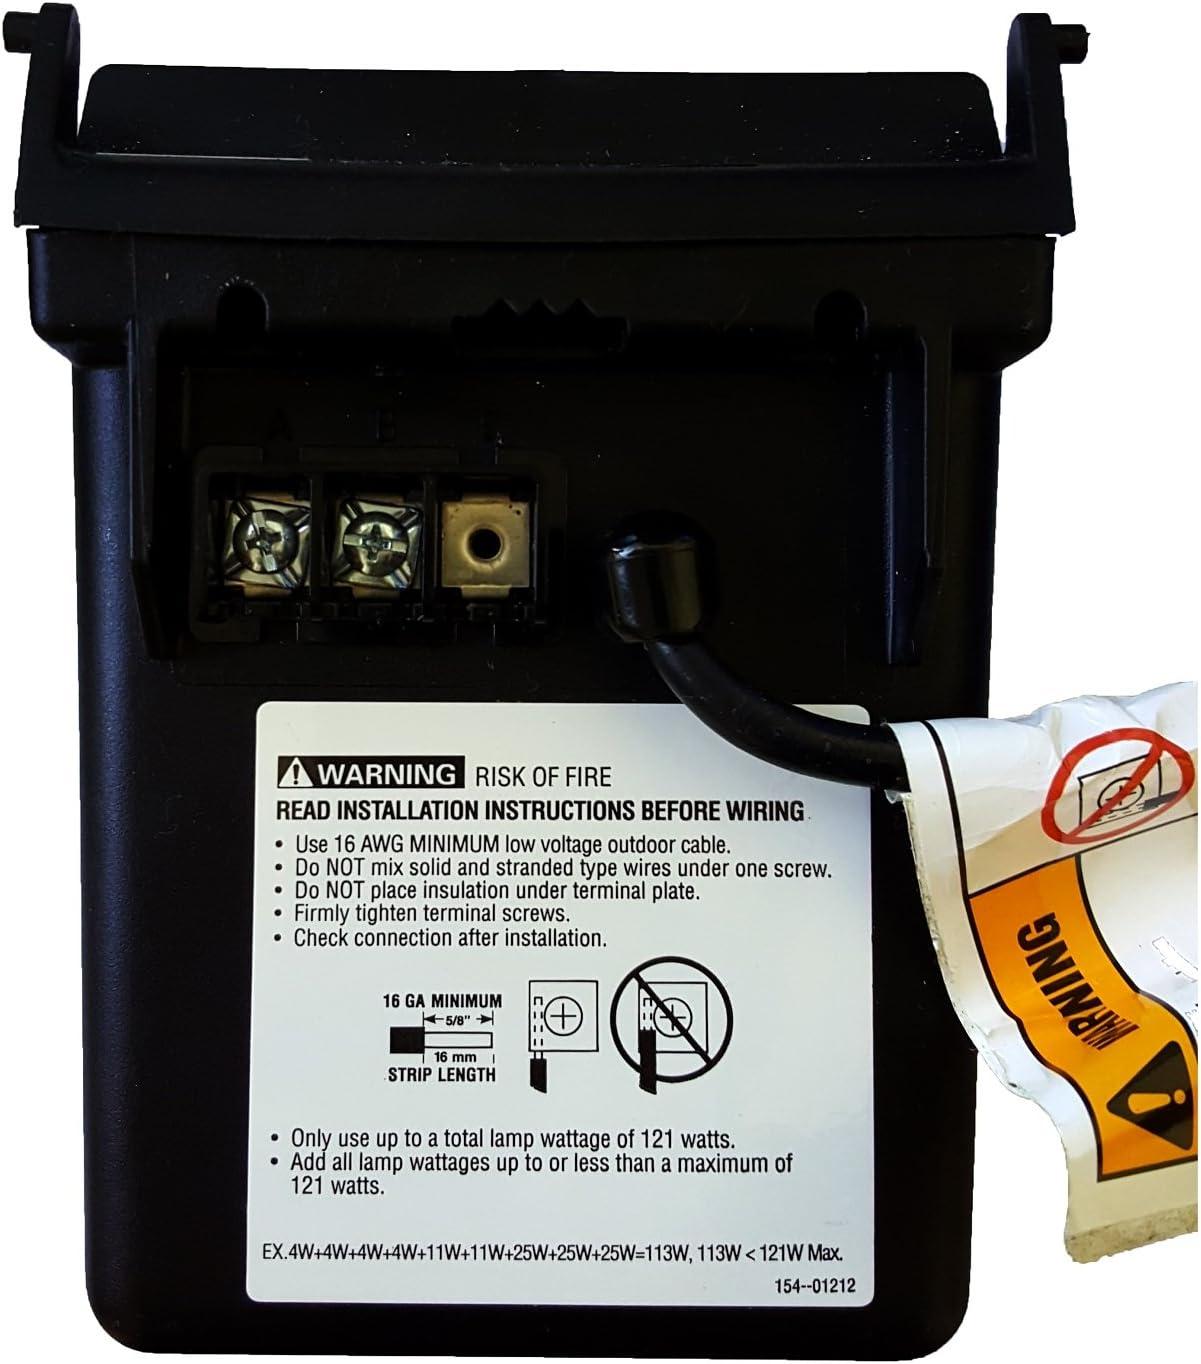 Malibu Ml121rt 121 Watt Low Voltage Power Pack Transformer Lighting Accessories Black Matte Low Voltage Transformers Lighting Ceiling Fans Lighting Accessories